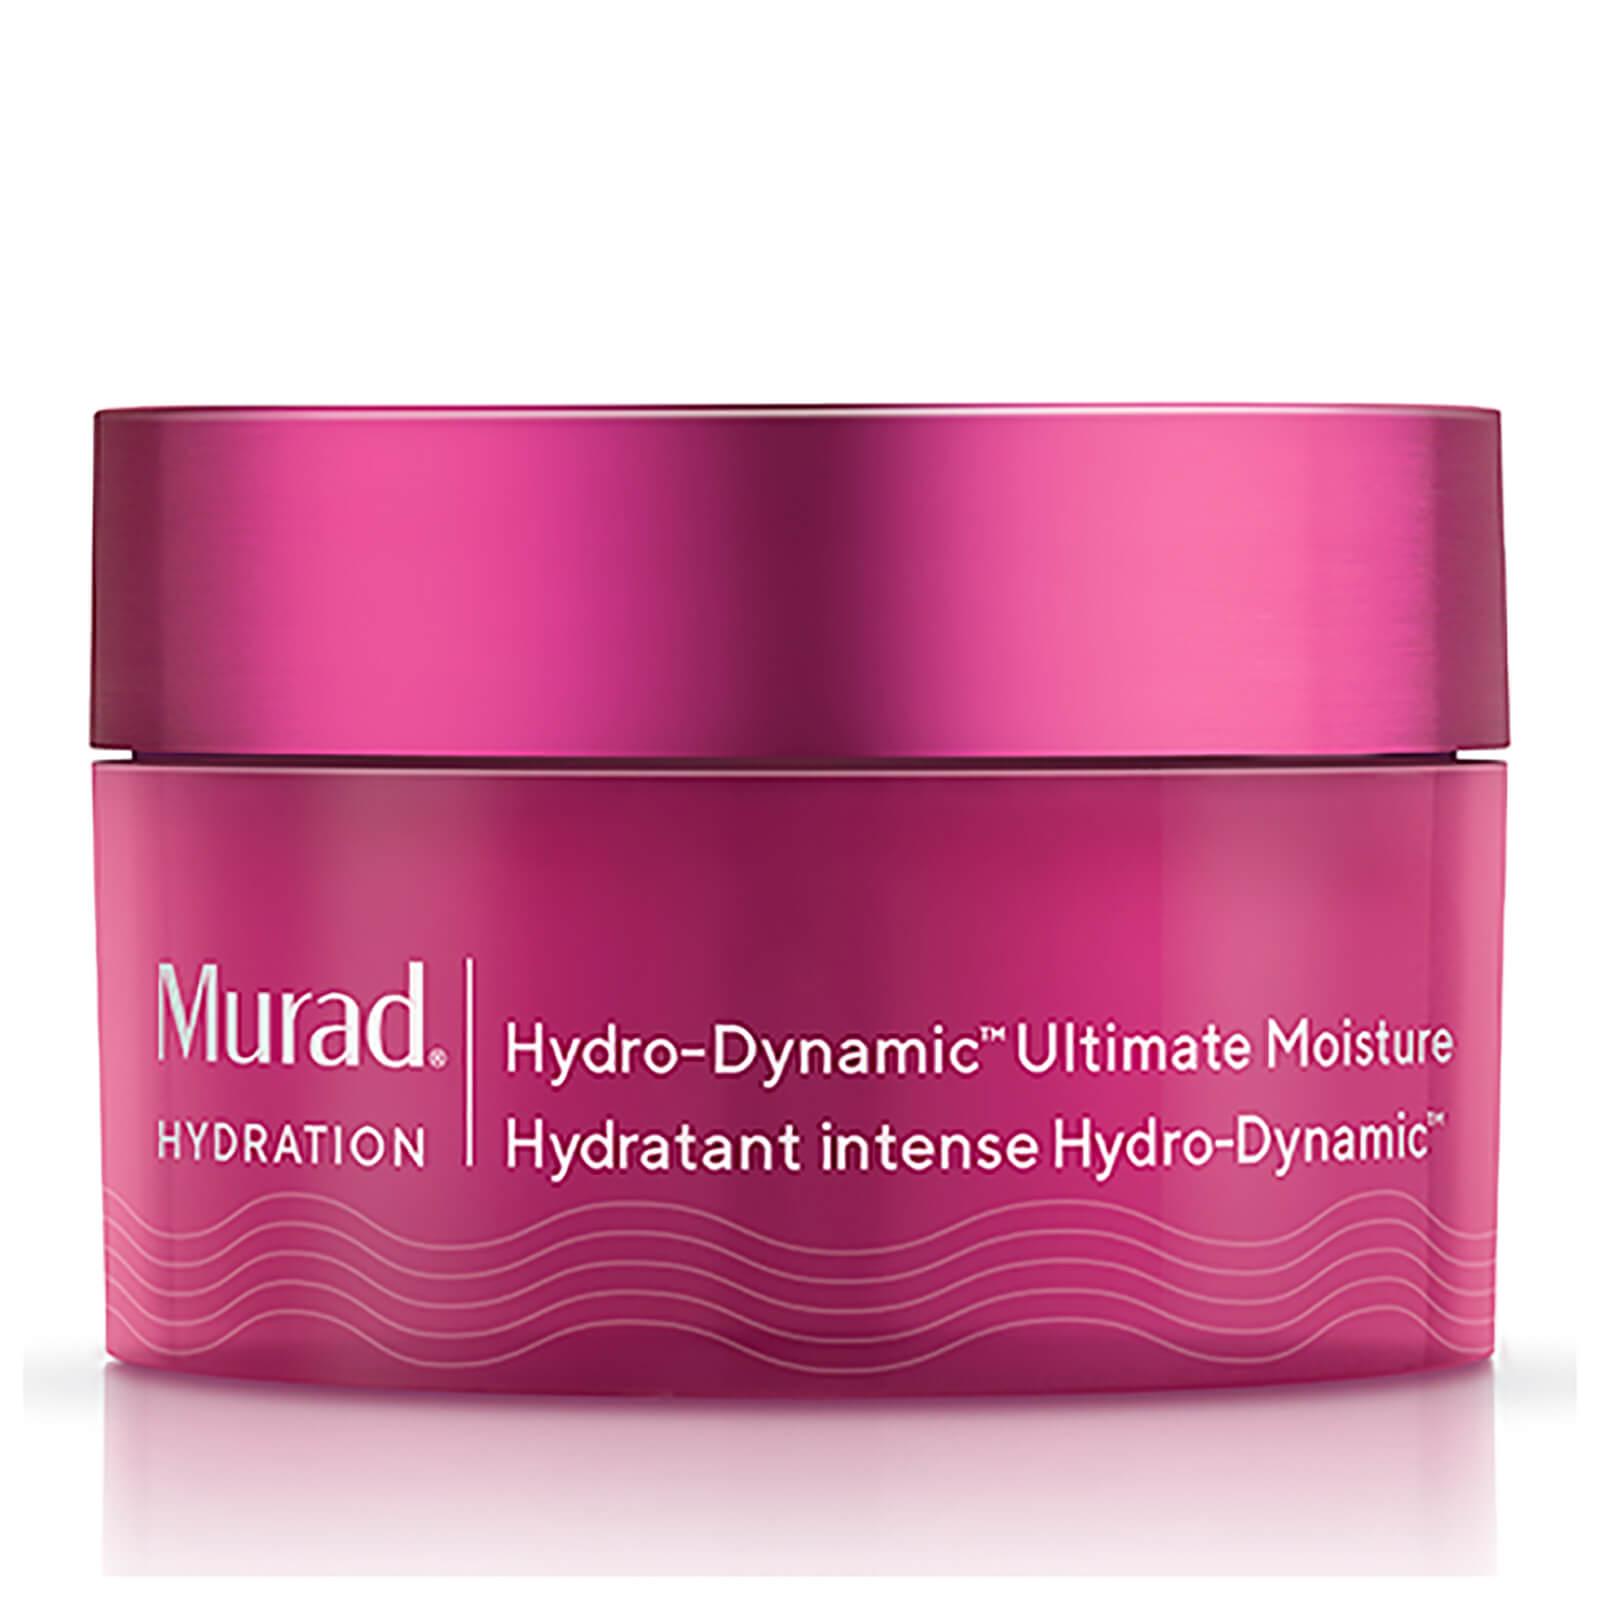 Murad Hydro-Dynamic™ Ultimate Moisture crema idratante (50 ml)